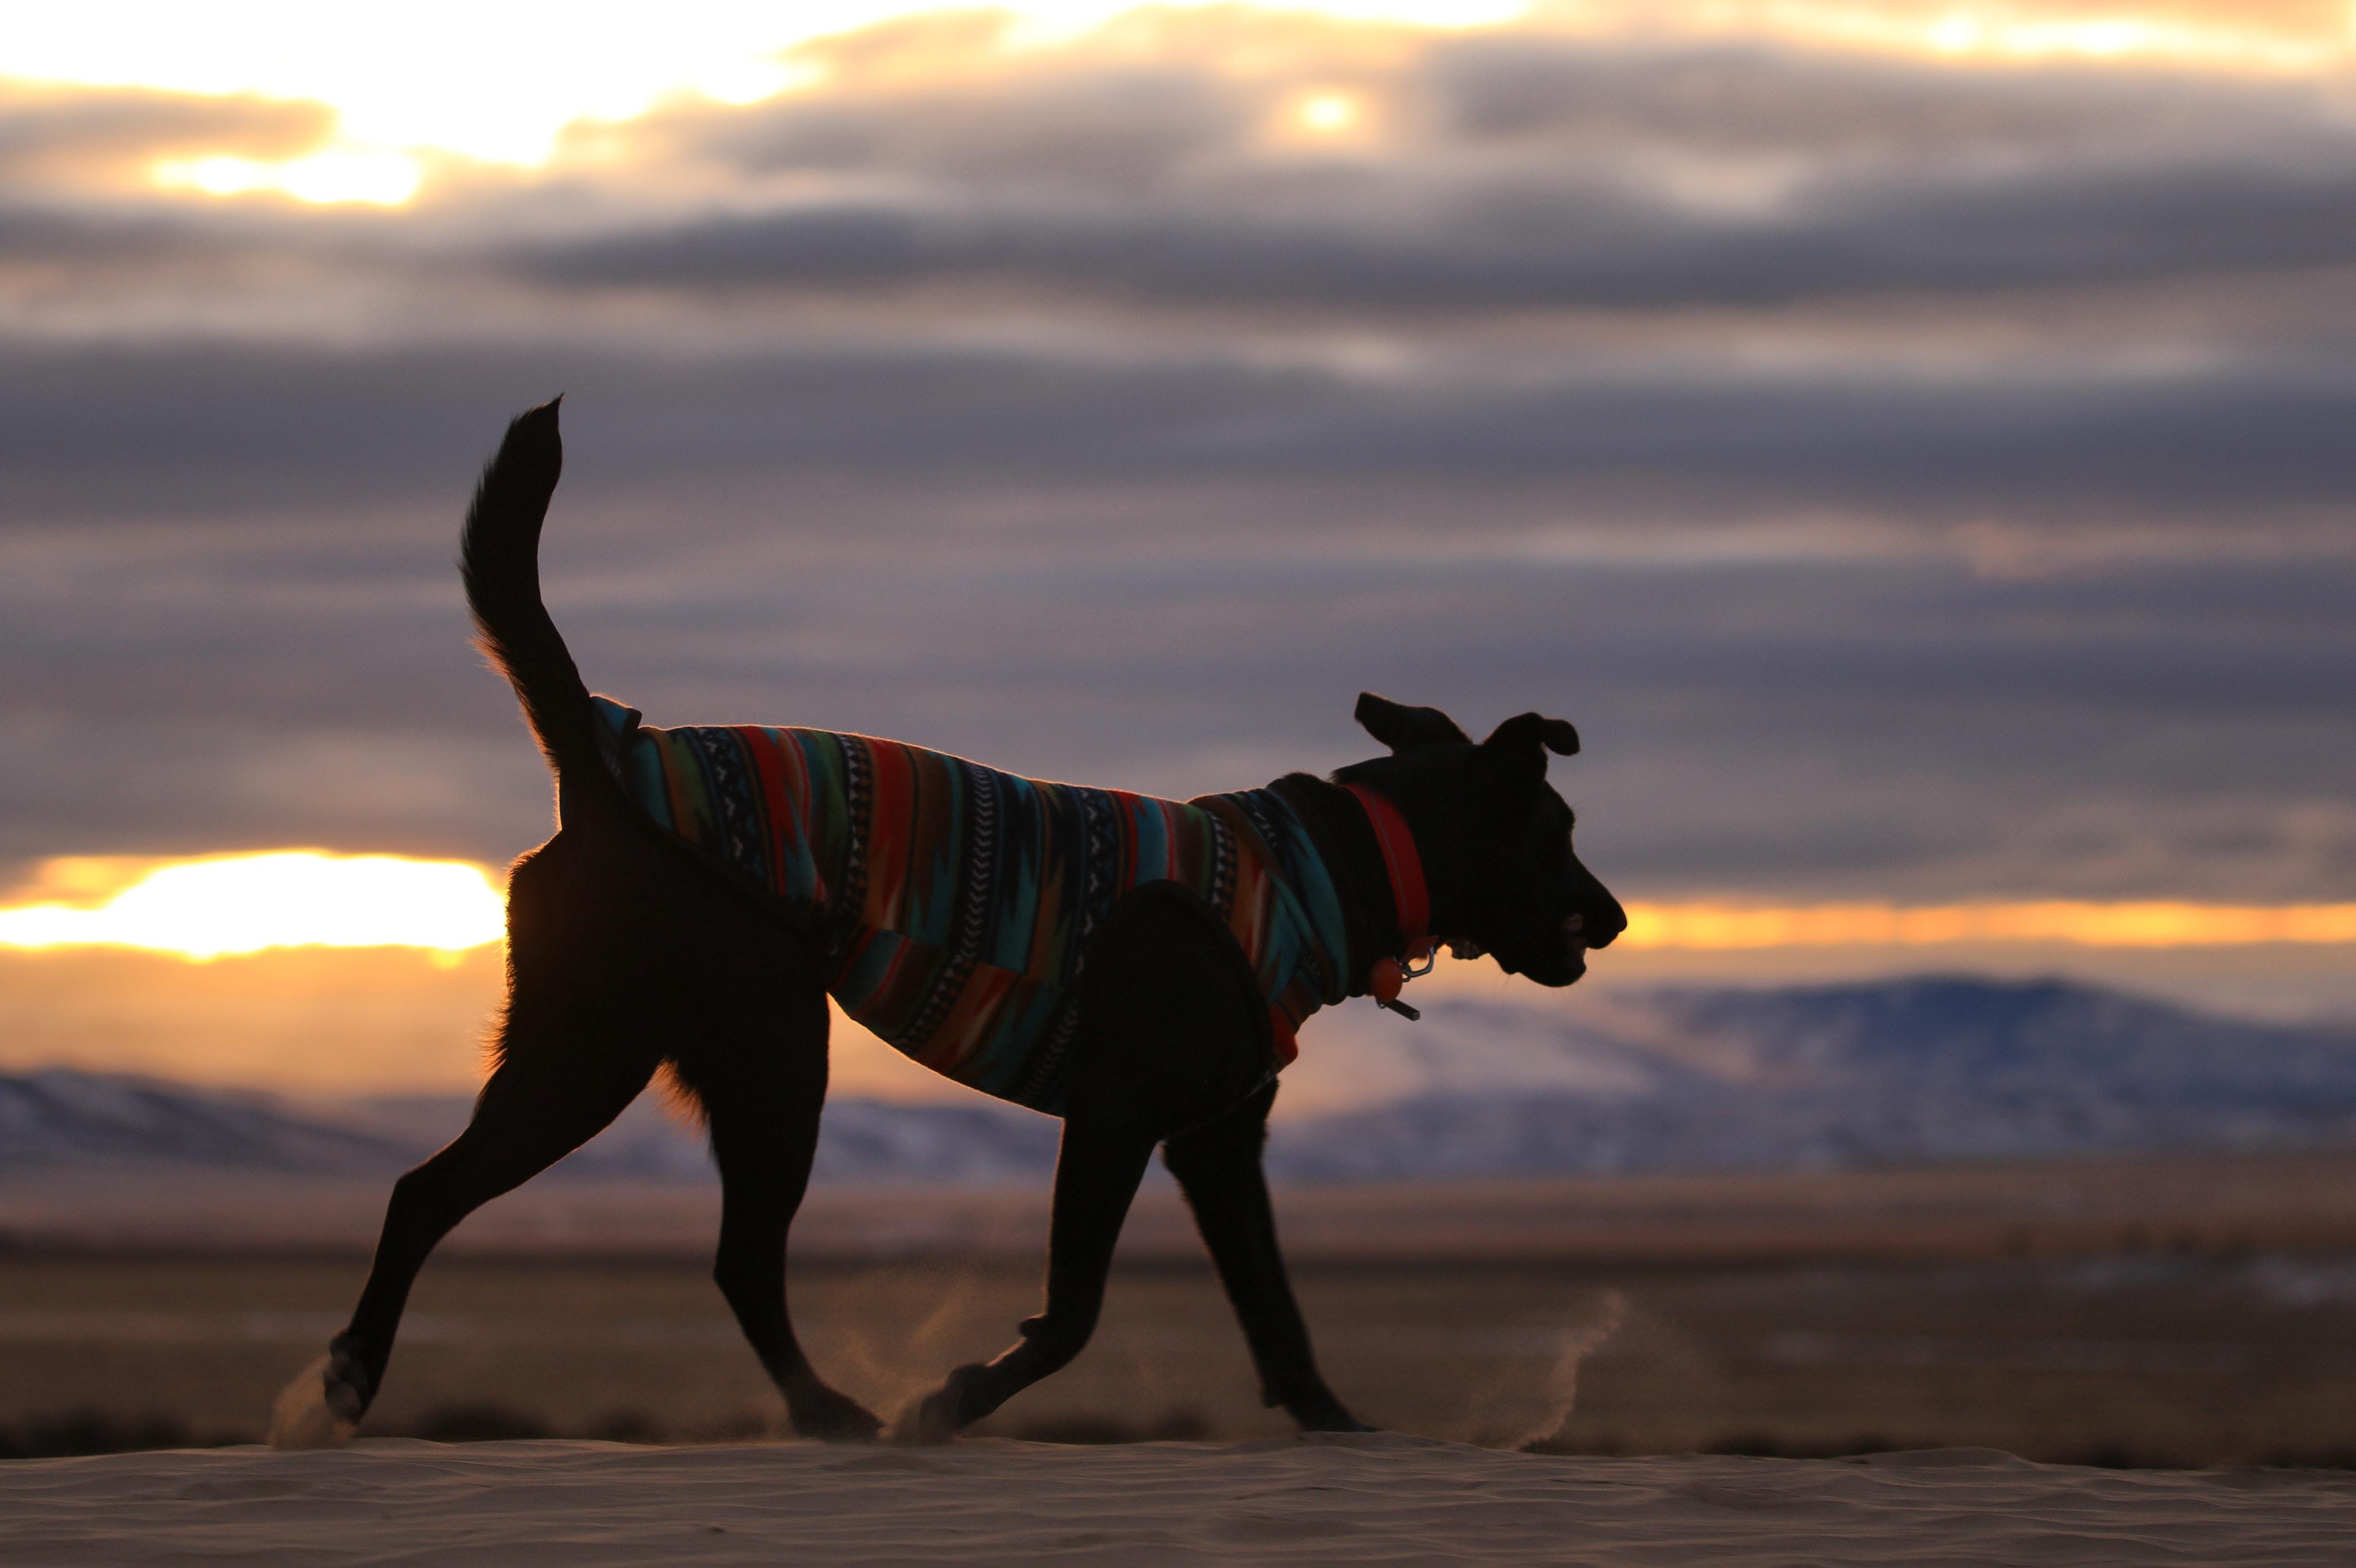 dog walking on road during dusk